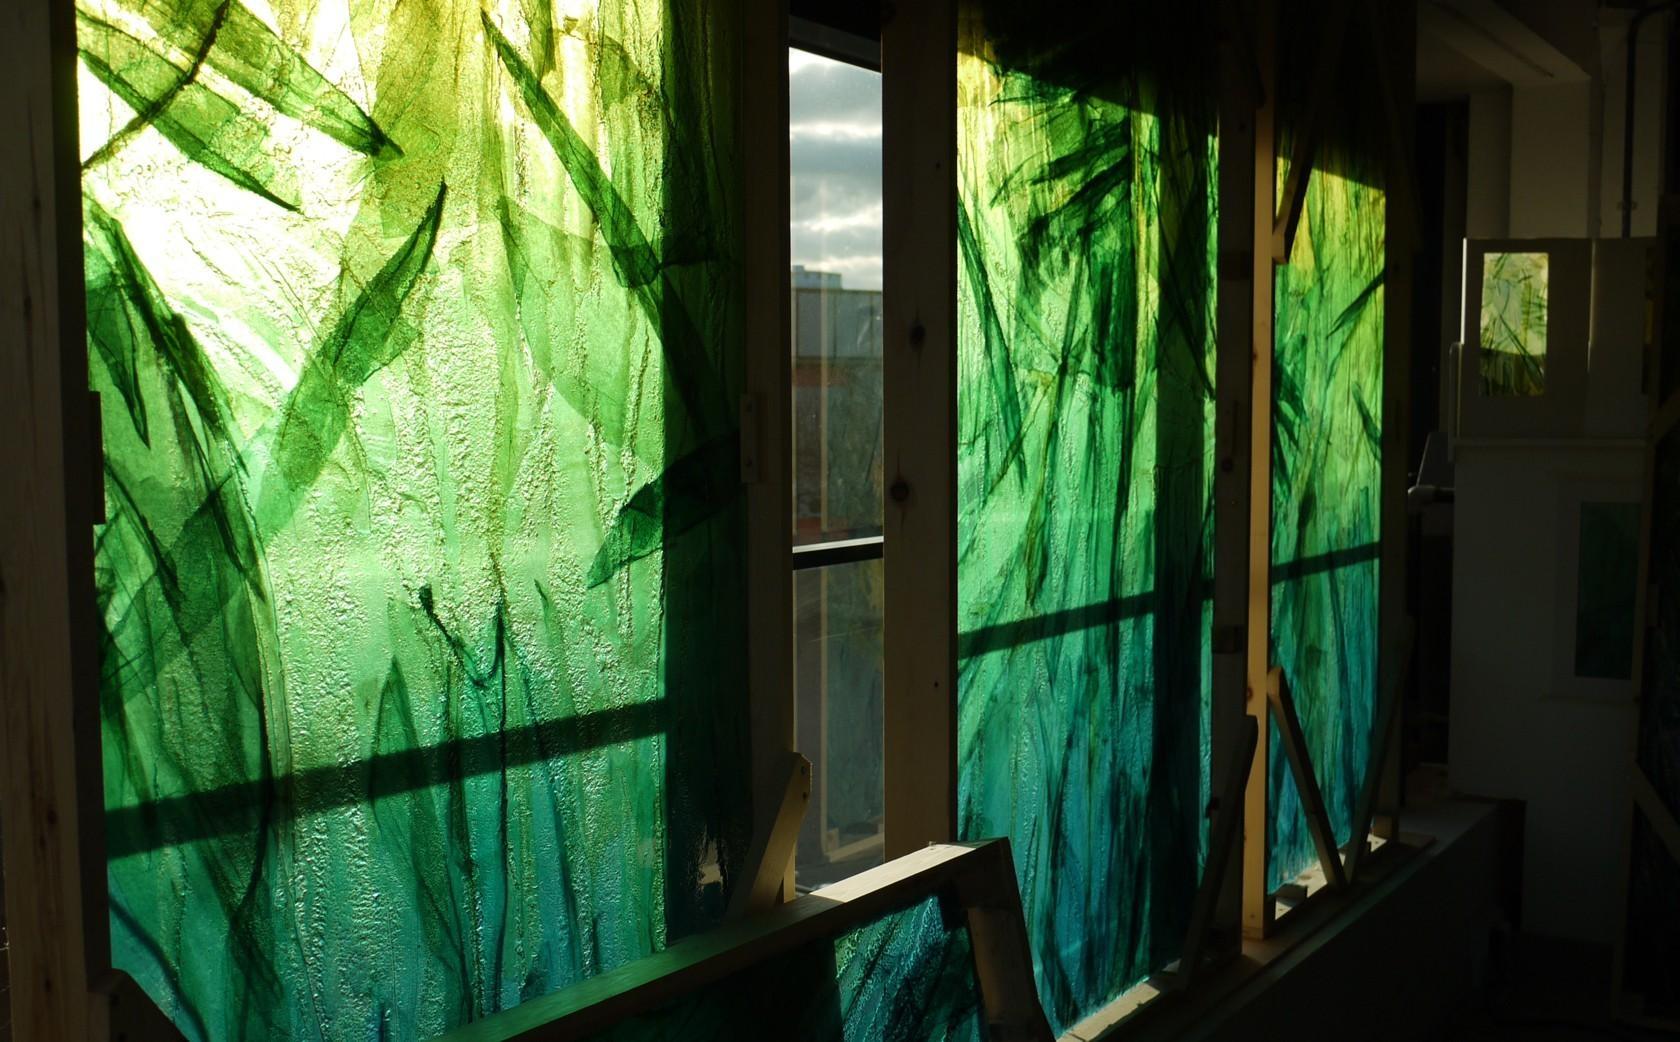 Slumped Glass Wall Art – Bradley+Basso Studio For Glass Wall Artworks (Image 17 of 20)